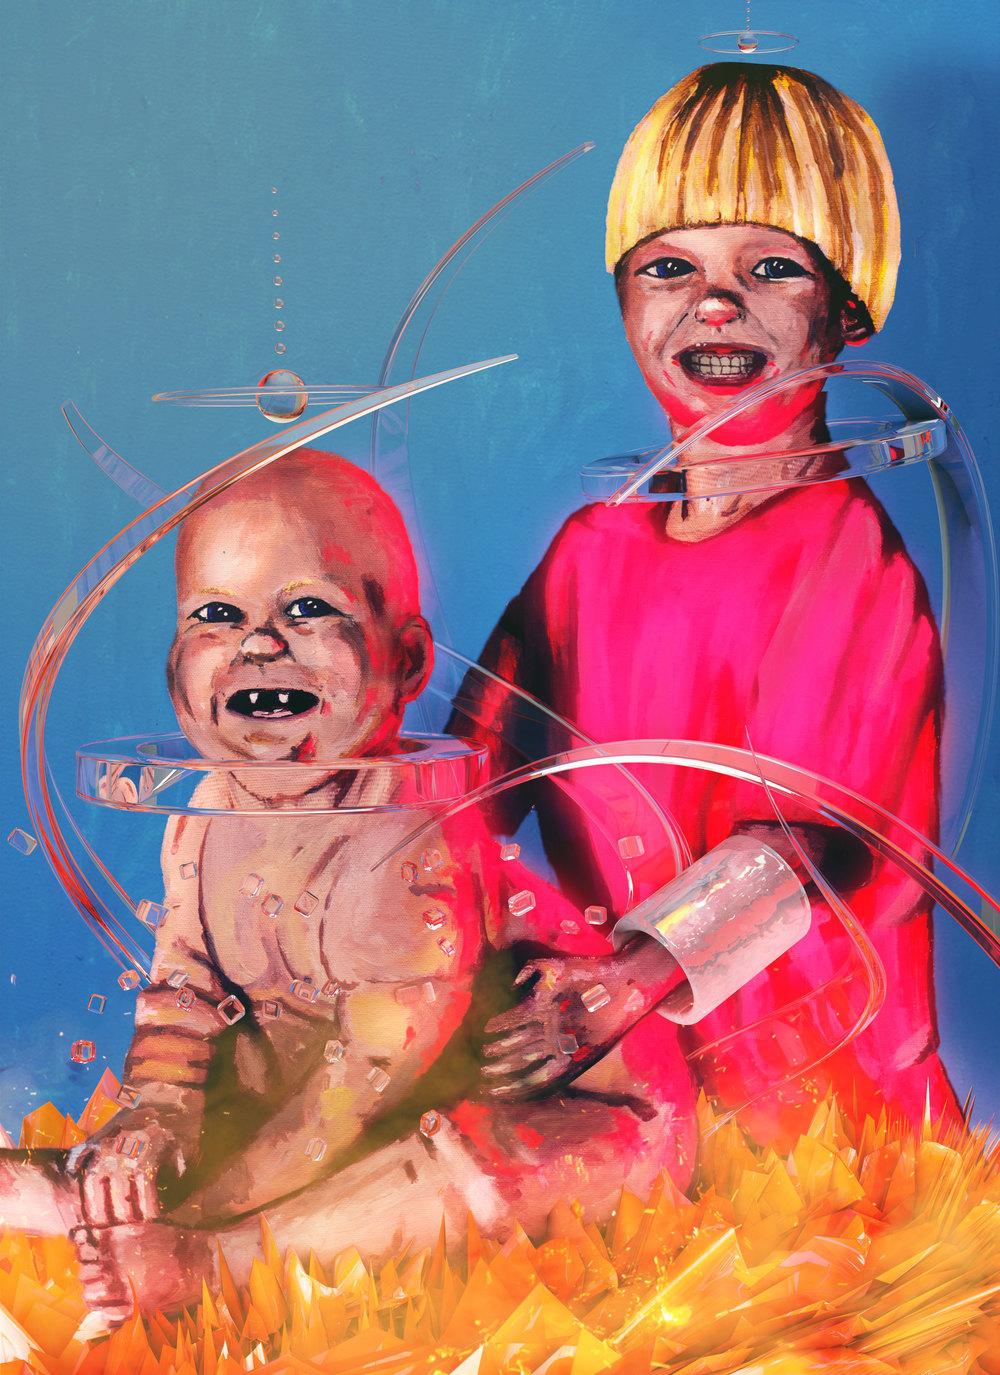 Neon Babies in Hell